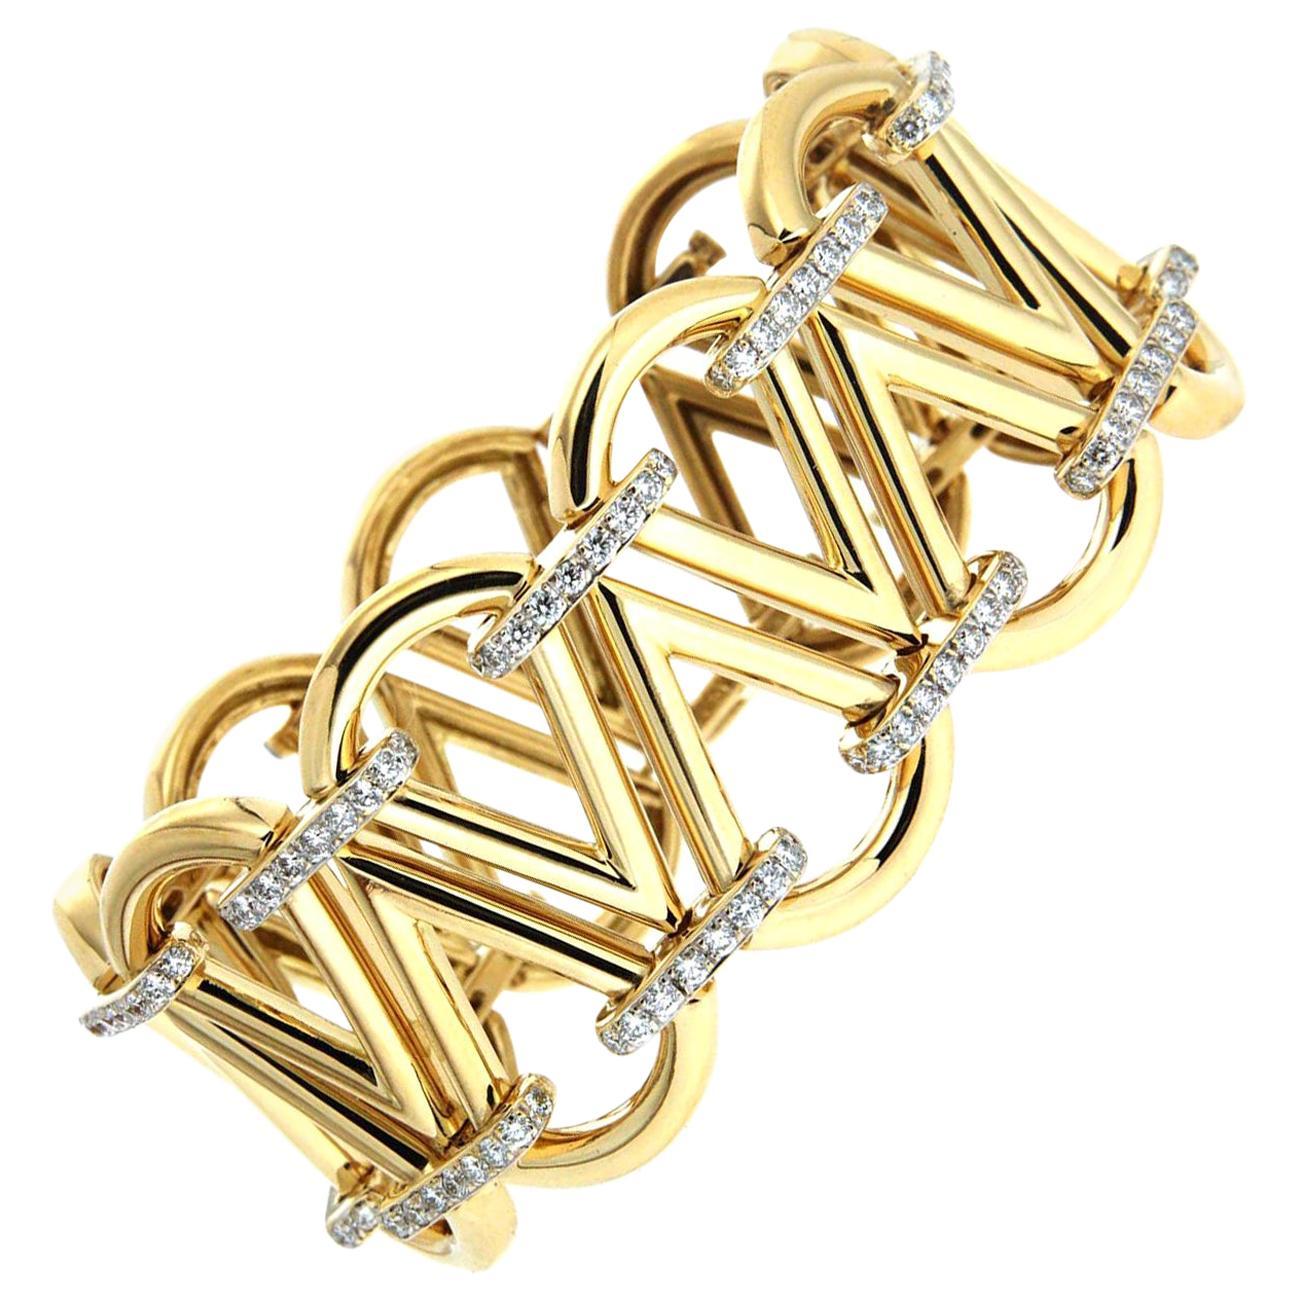 Valentin Magro Gold Cone Diamond Link Bracelet